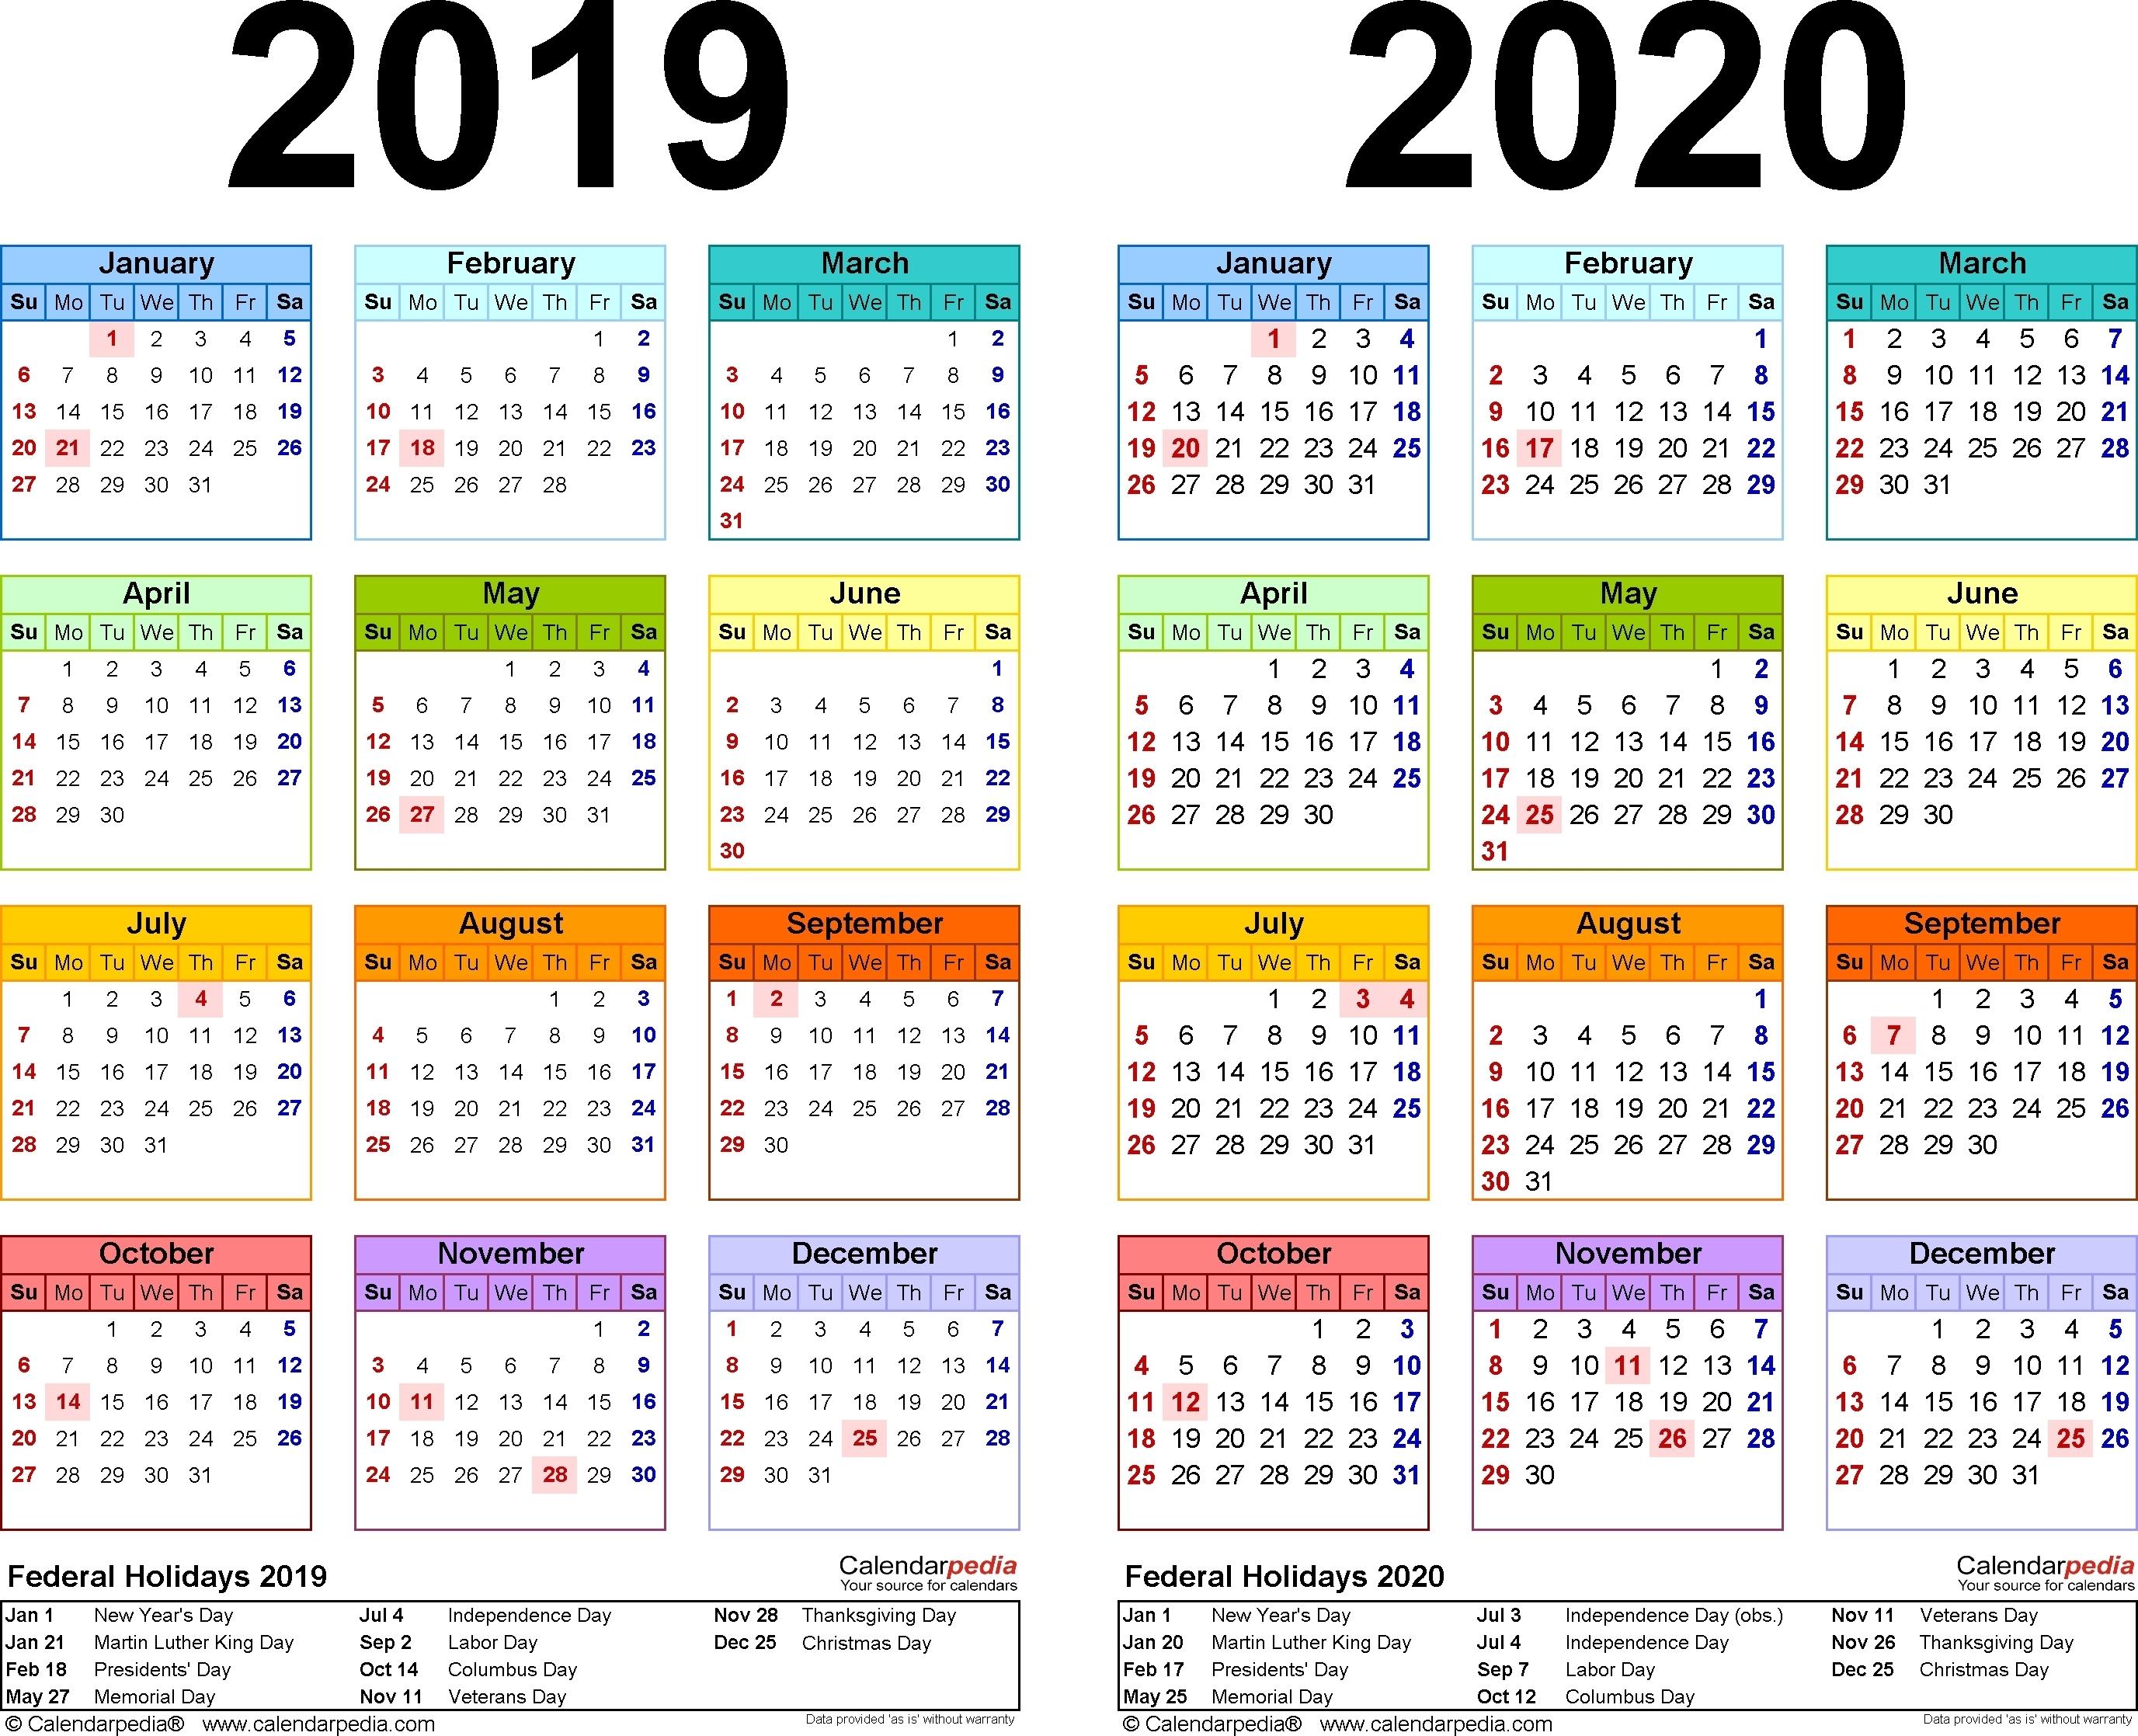 Https://idlewildfurnishing/2020-Blank-Hk-Calender/ 2019-January 2020 Calendar Hk